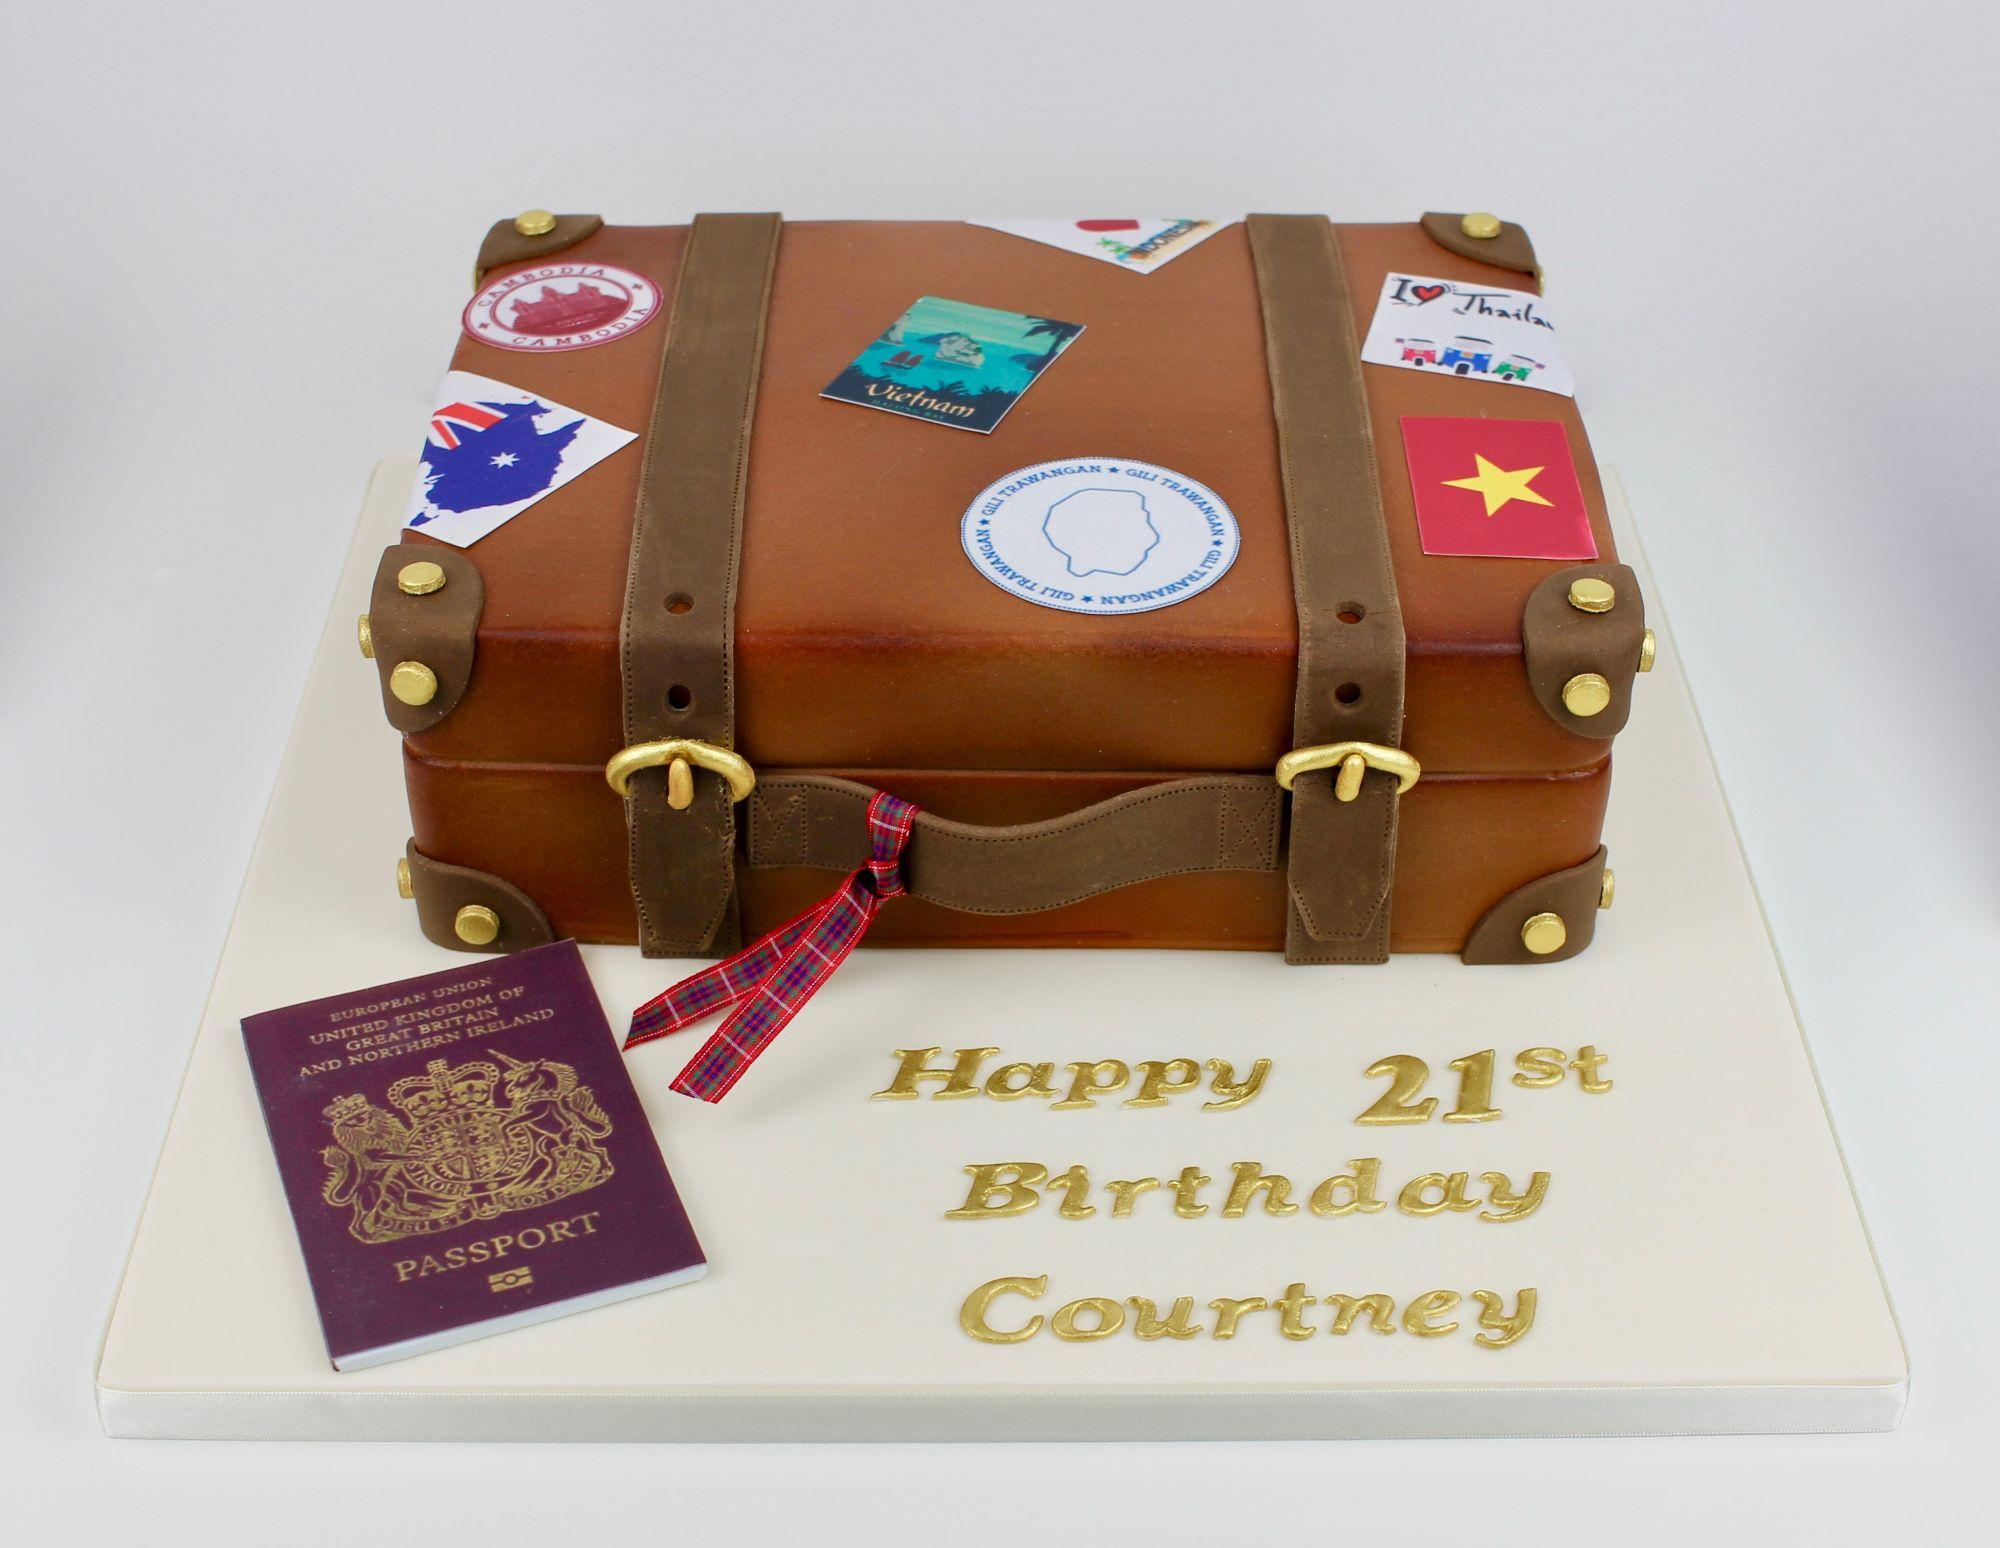 Travel suitcase themed cake